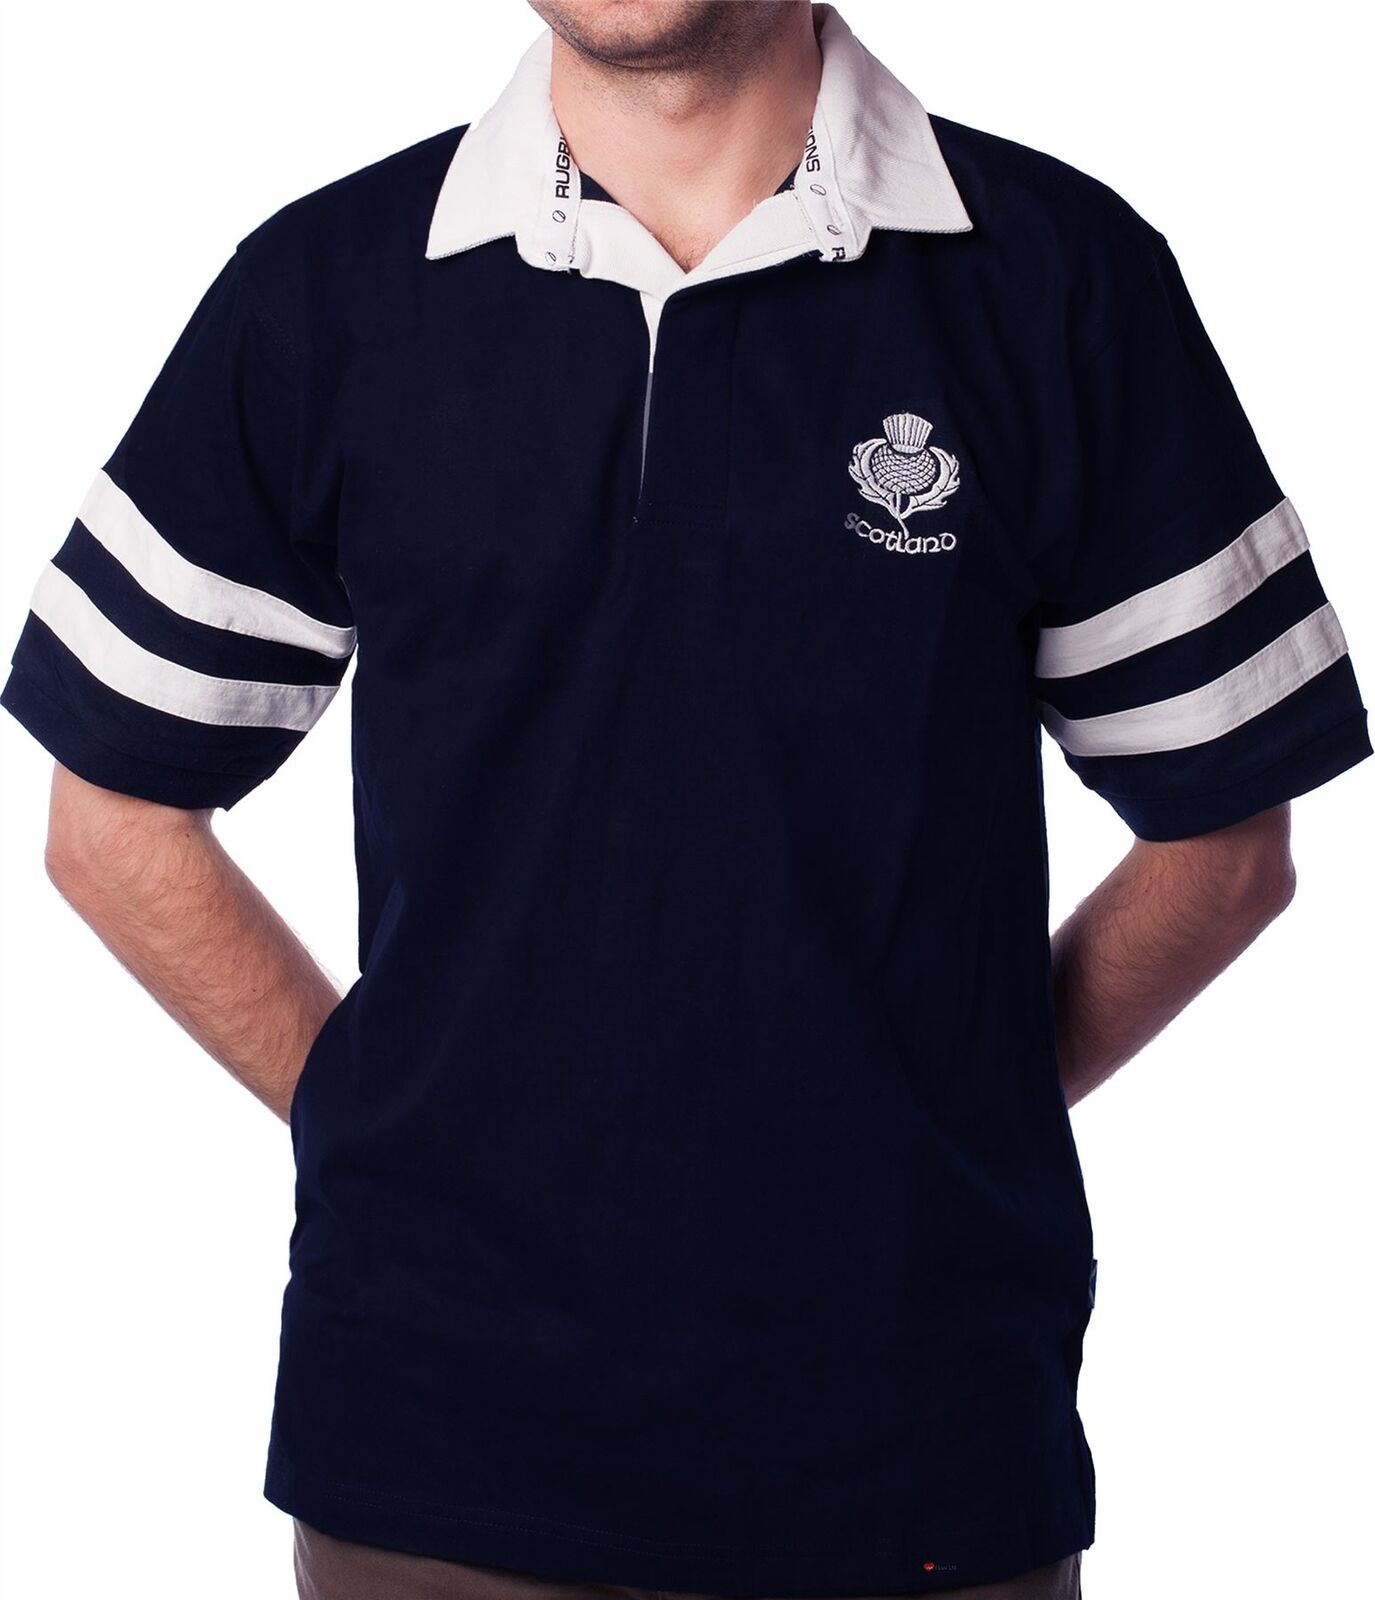 Gents Rugby Shirt Scotland Thistle Logo 2 Stripe Short Sleeve Navy Size Large